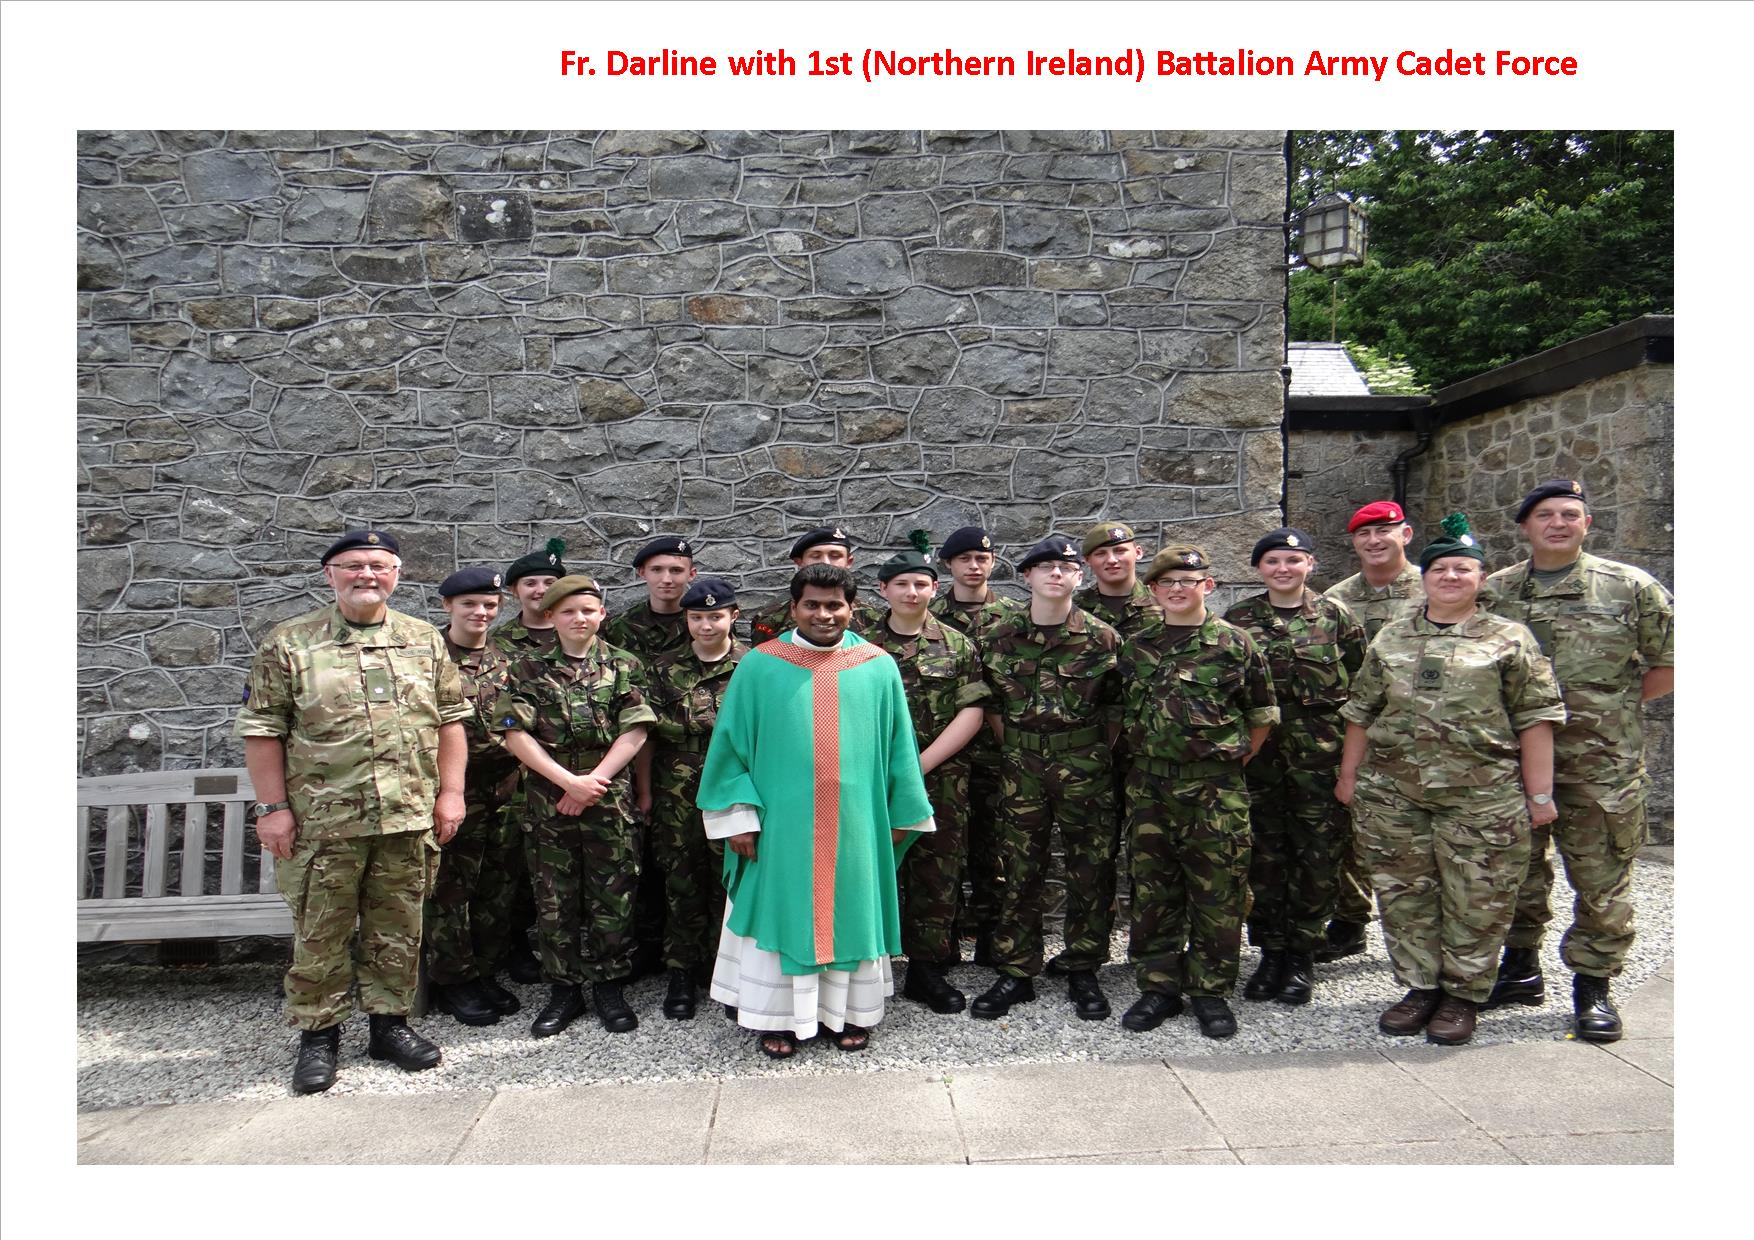 fr-darline-with-1st-northern-ireland-battalion-army-cadet-force